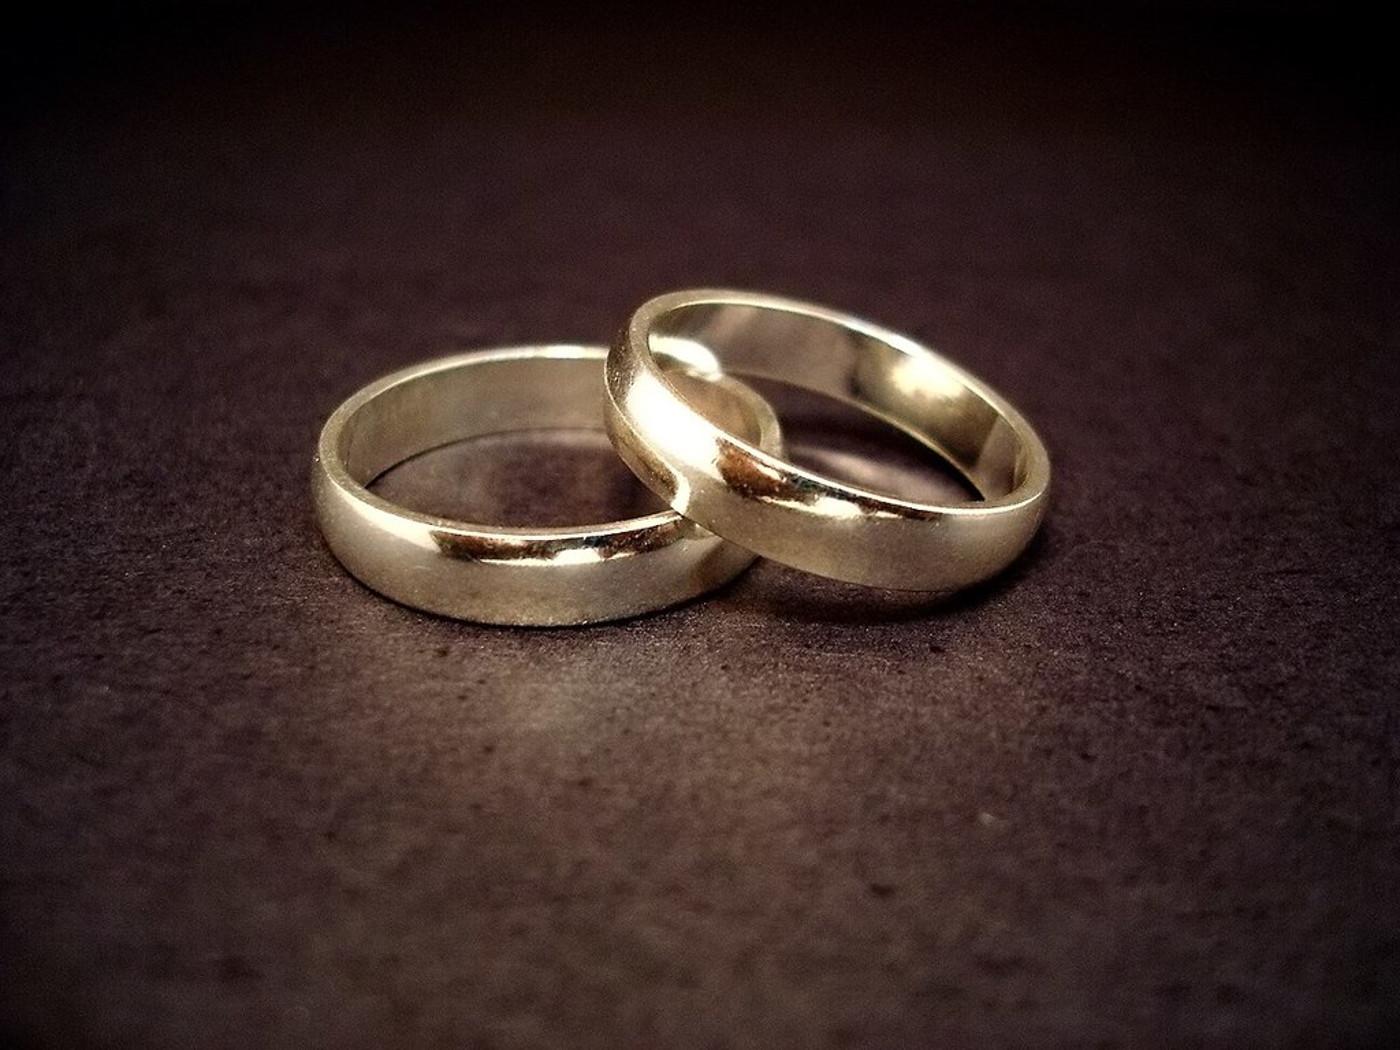 a786a19b5ab8 Anillos de Compromiso y Alianzas de Matrimonio